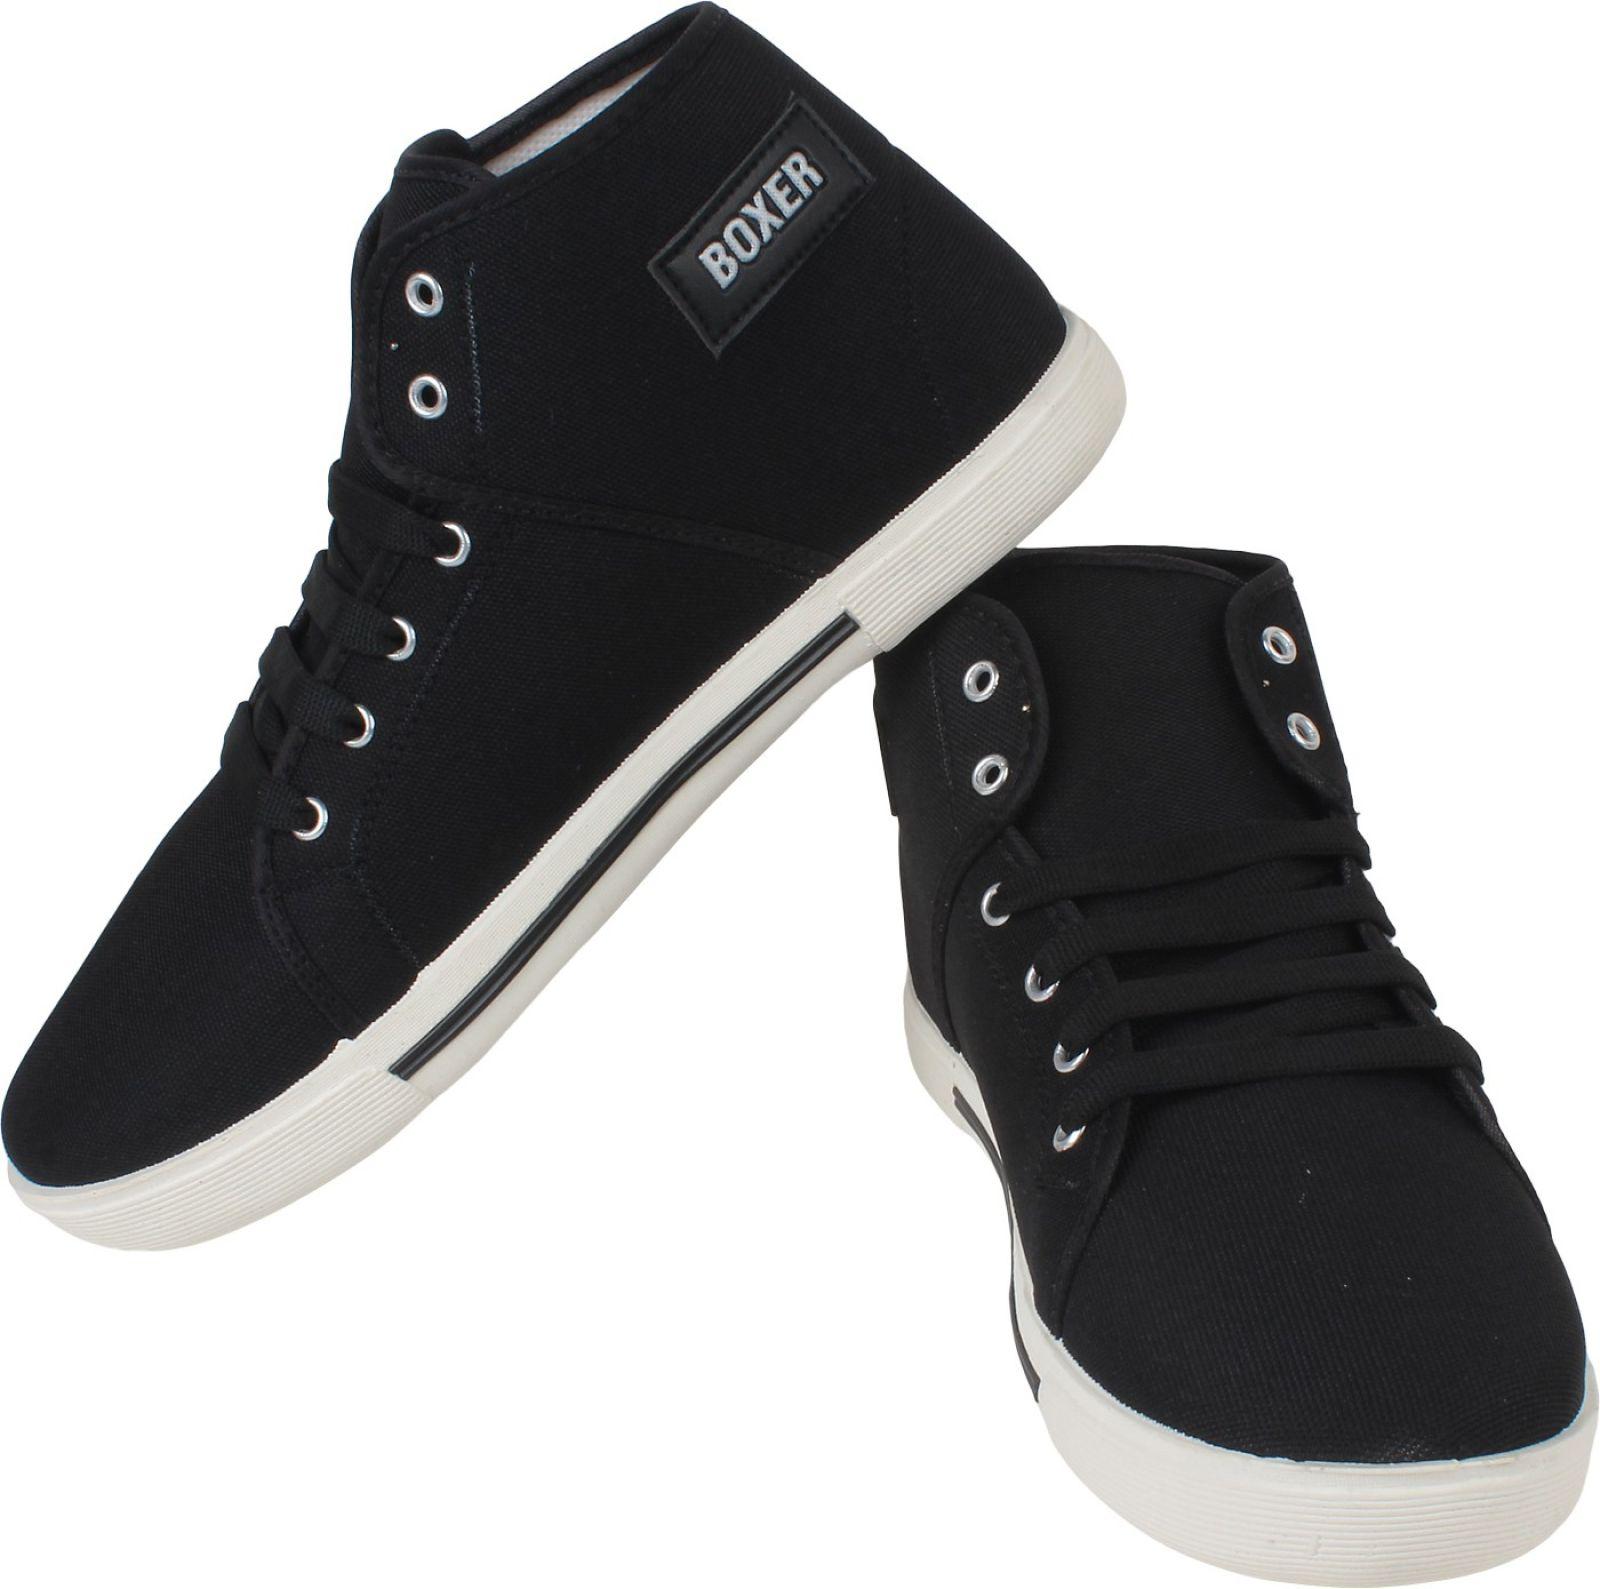 Oricum Boxer-303 Sneakers For Men (Black)